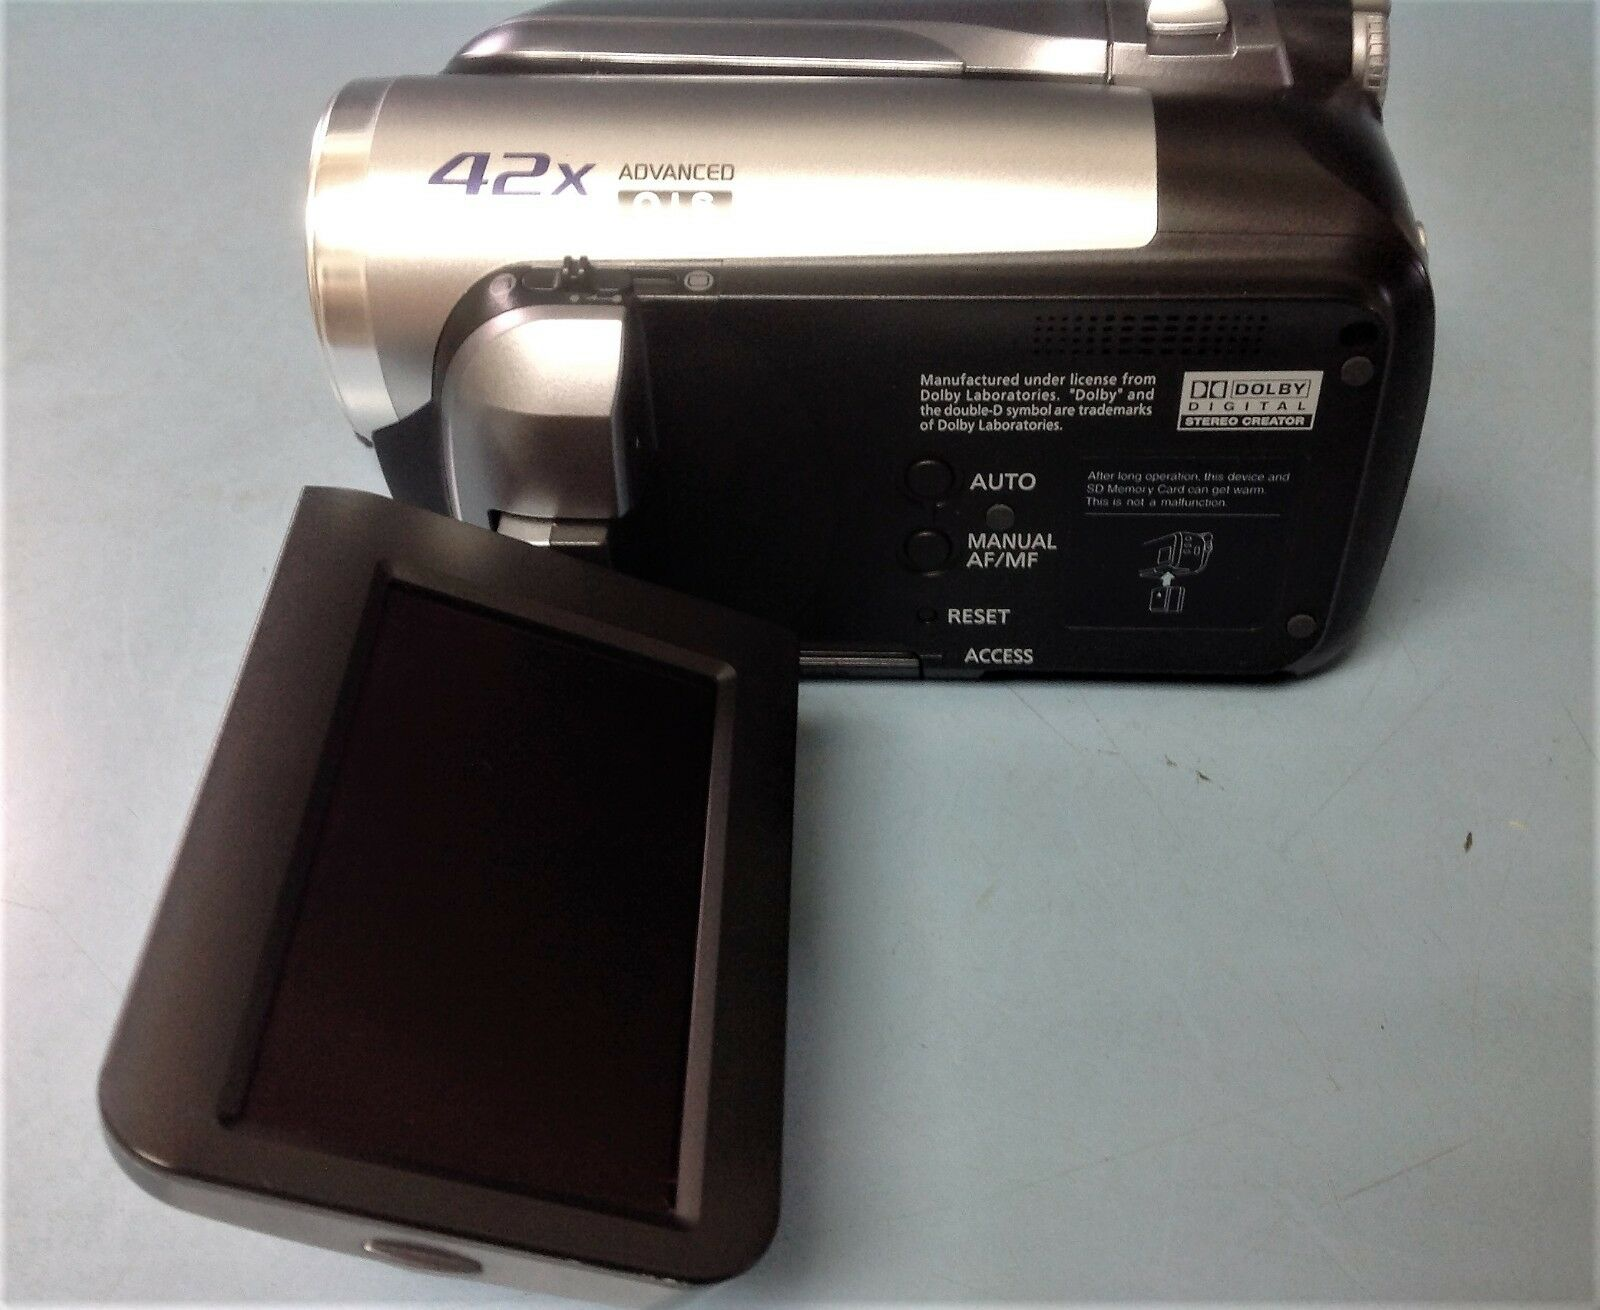 panasonic sdr h40 40 gb hard drive camcorder ebay rh ebay com panasonic hdd camcorder 42x manual